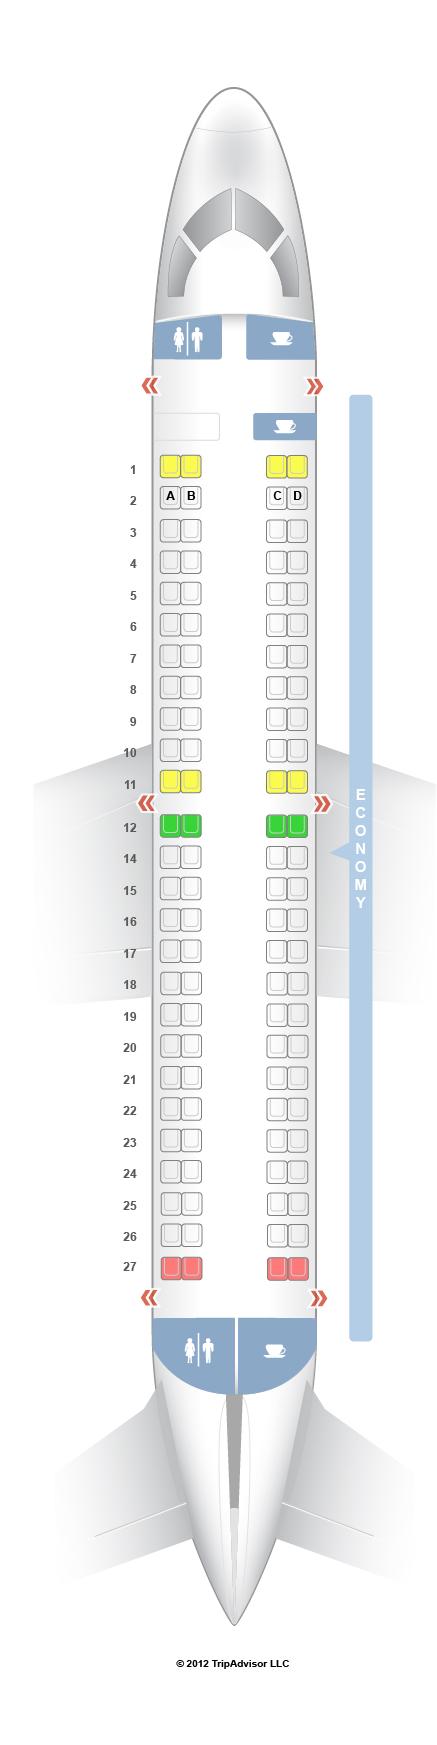 Seatguru seat map china airlines embraer e 190 - China southern airlines hong kong office ...